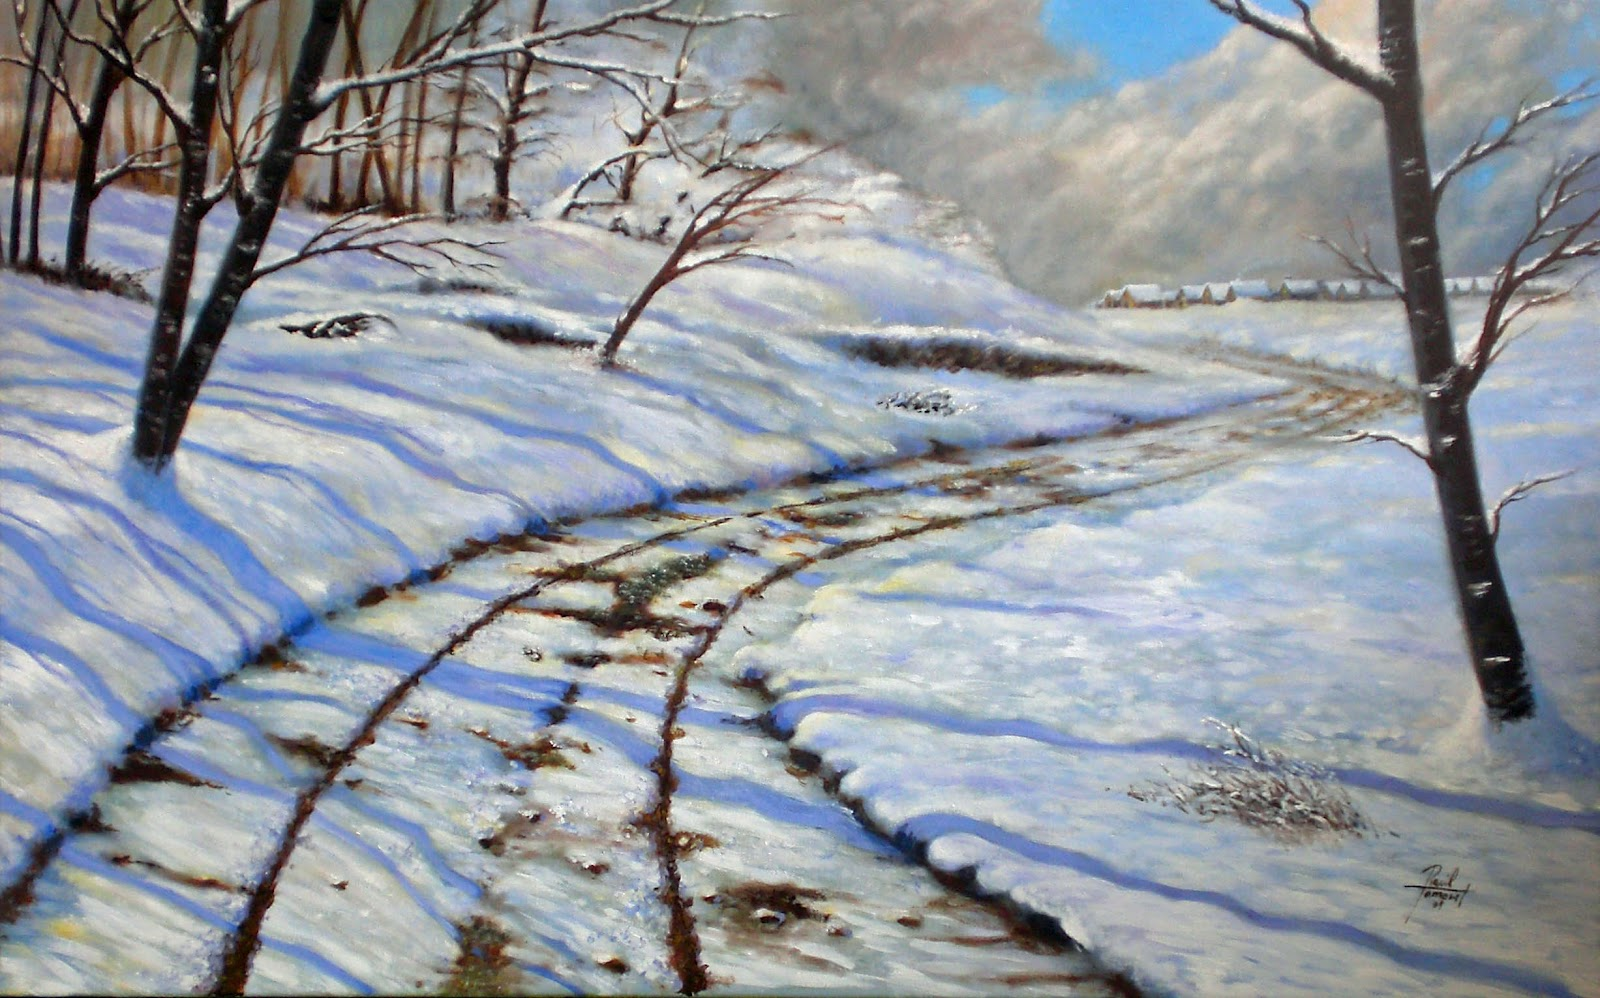 Paisaje nevado - -116x72 cm - óleo sobre lienzo b/ancho